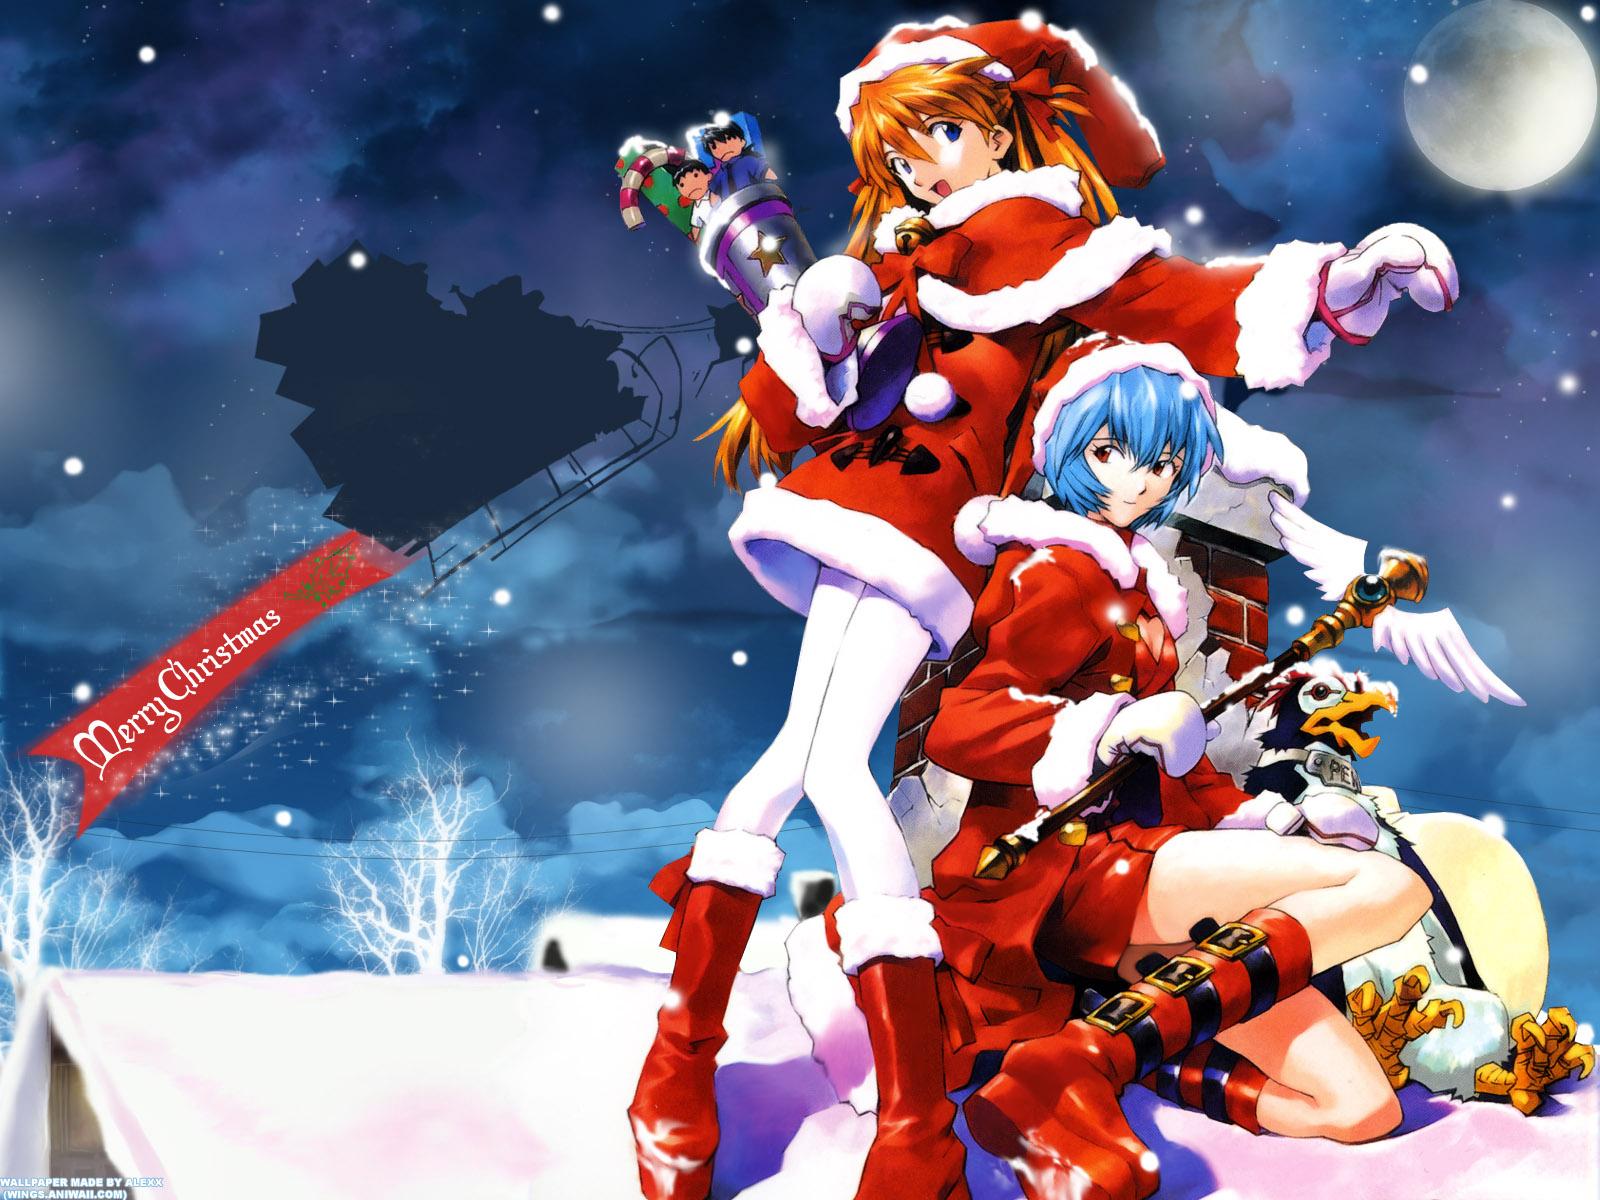 Kunoichi Island Images Anime Christmas Hd Wallpaper And Background